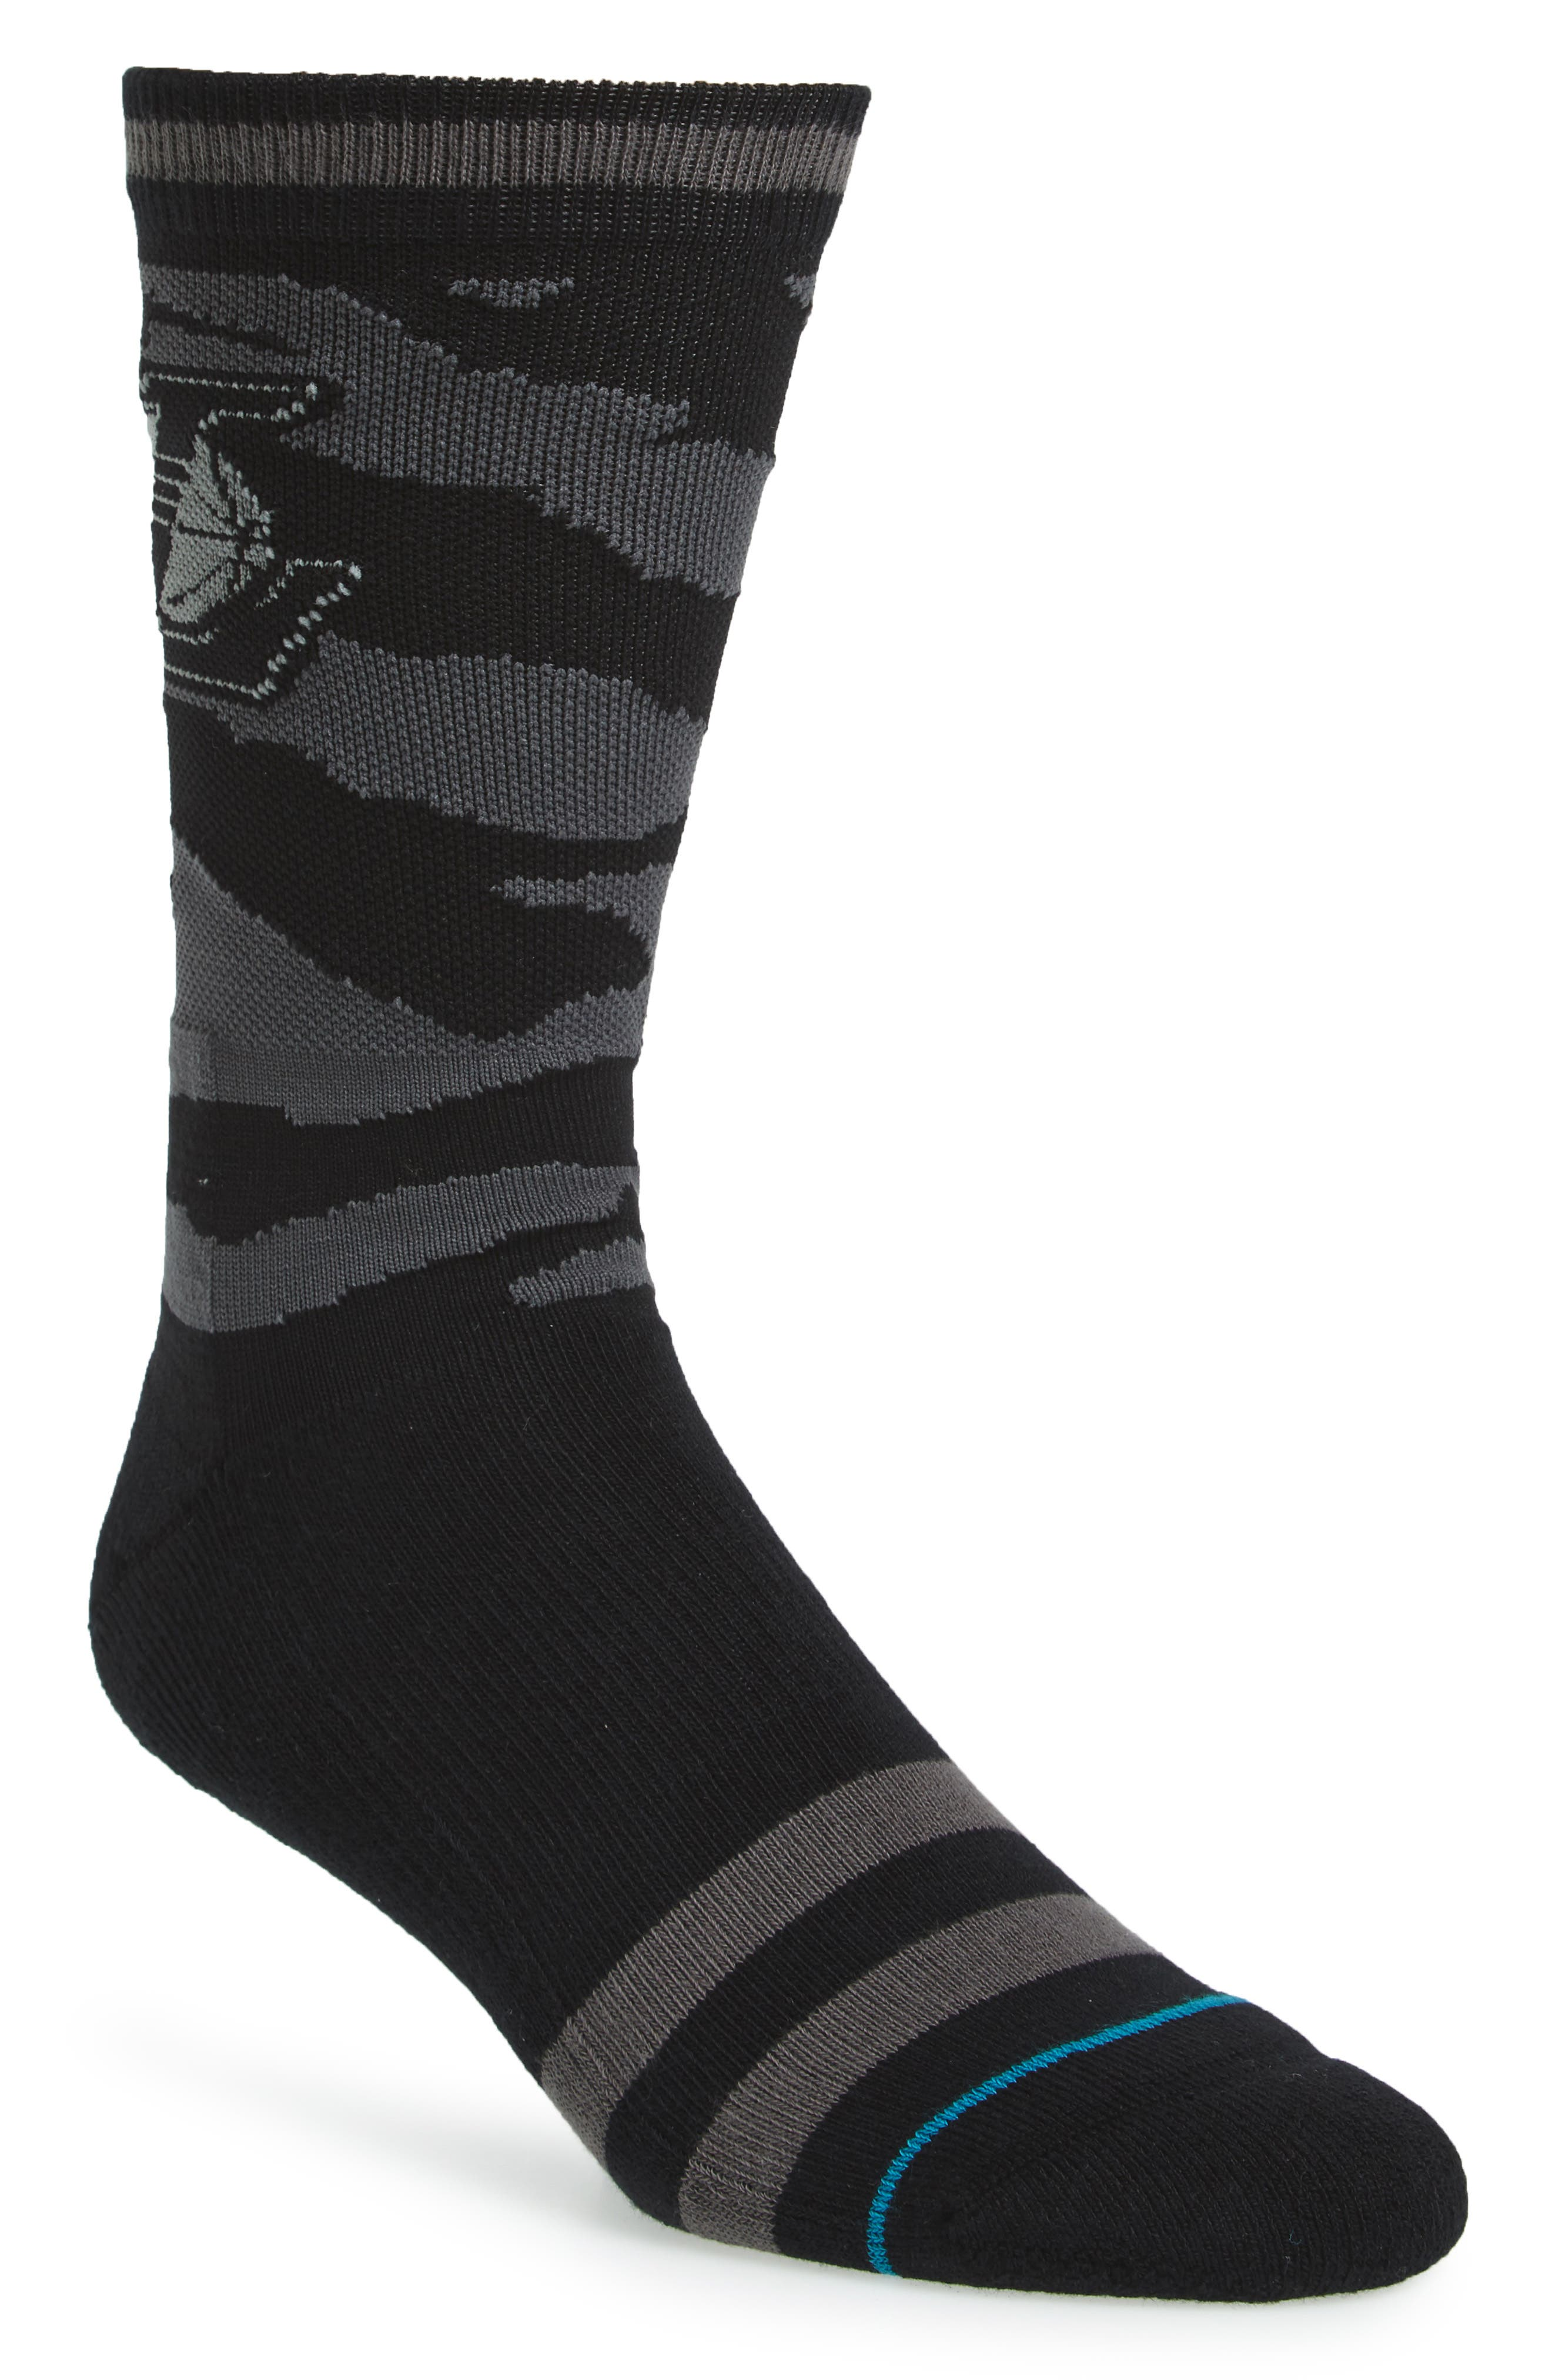 Alternate Image 1 Selected - Stance NBA Casual Nightfall Lakers Socks